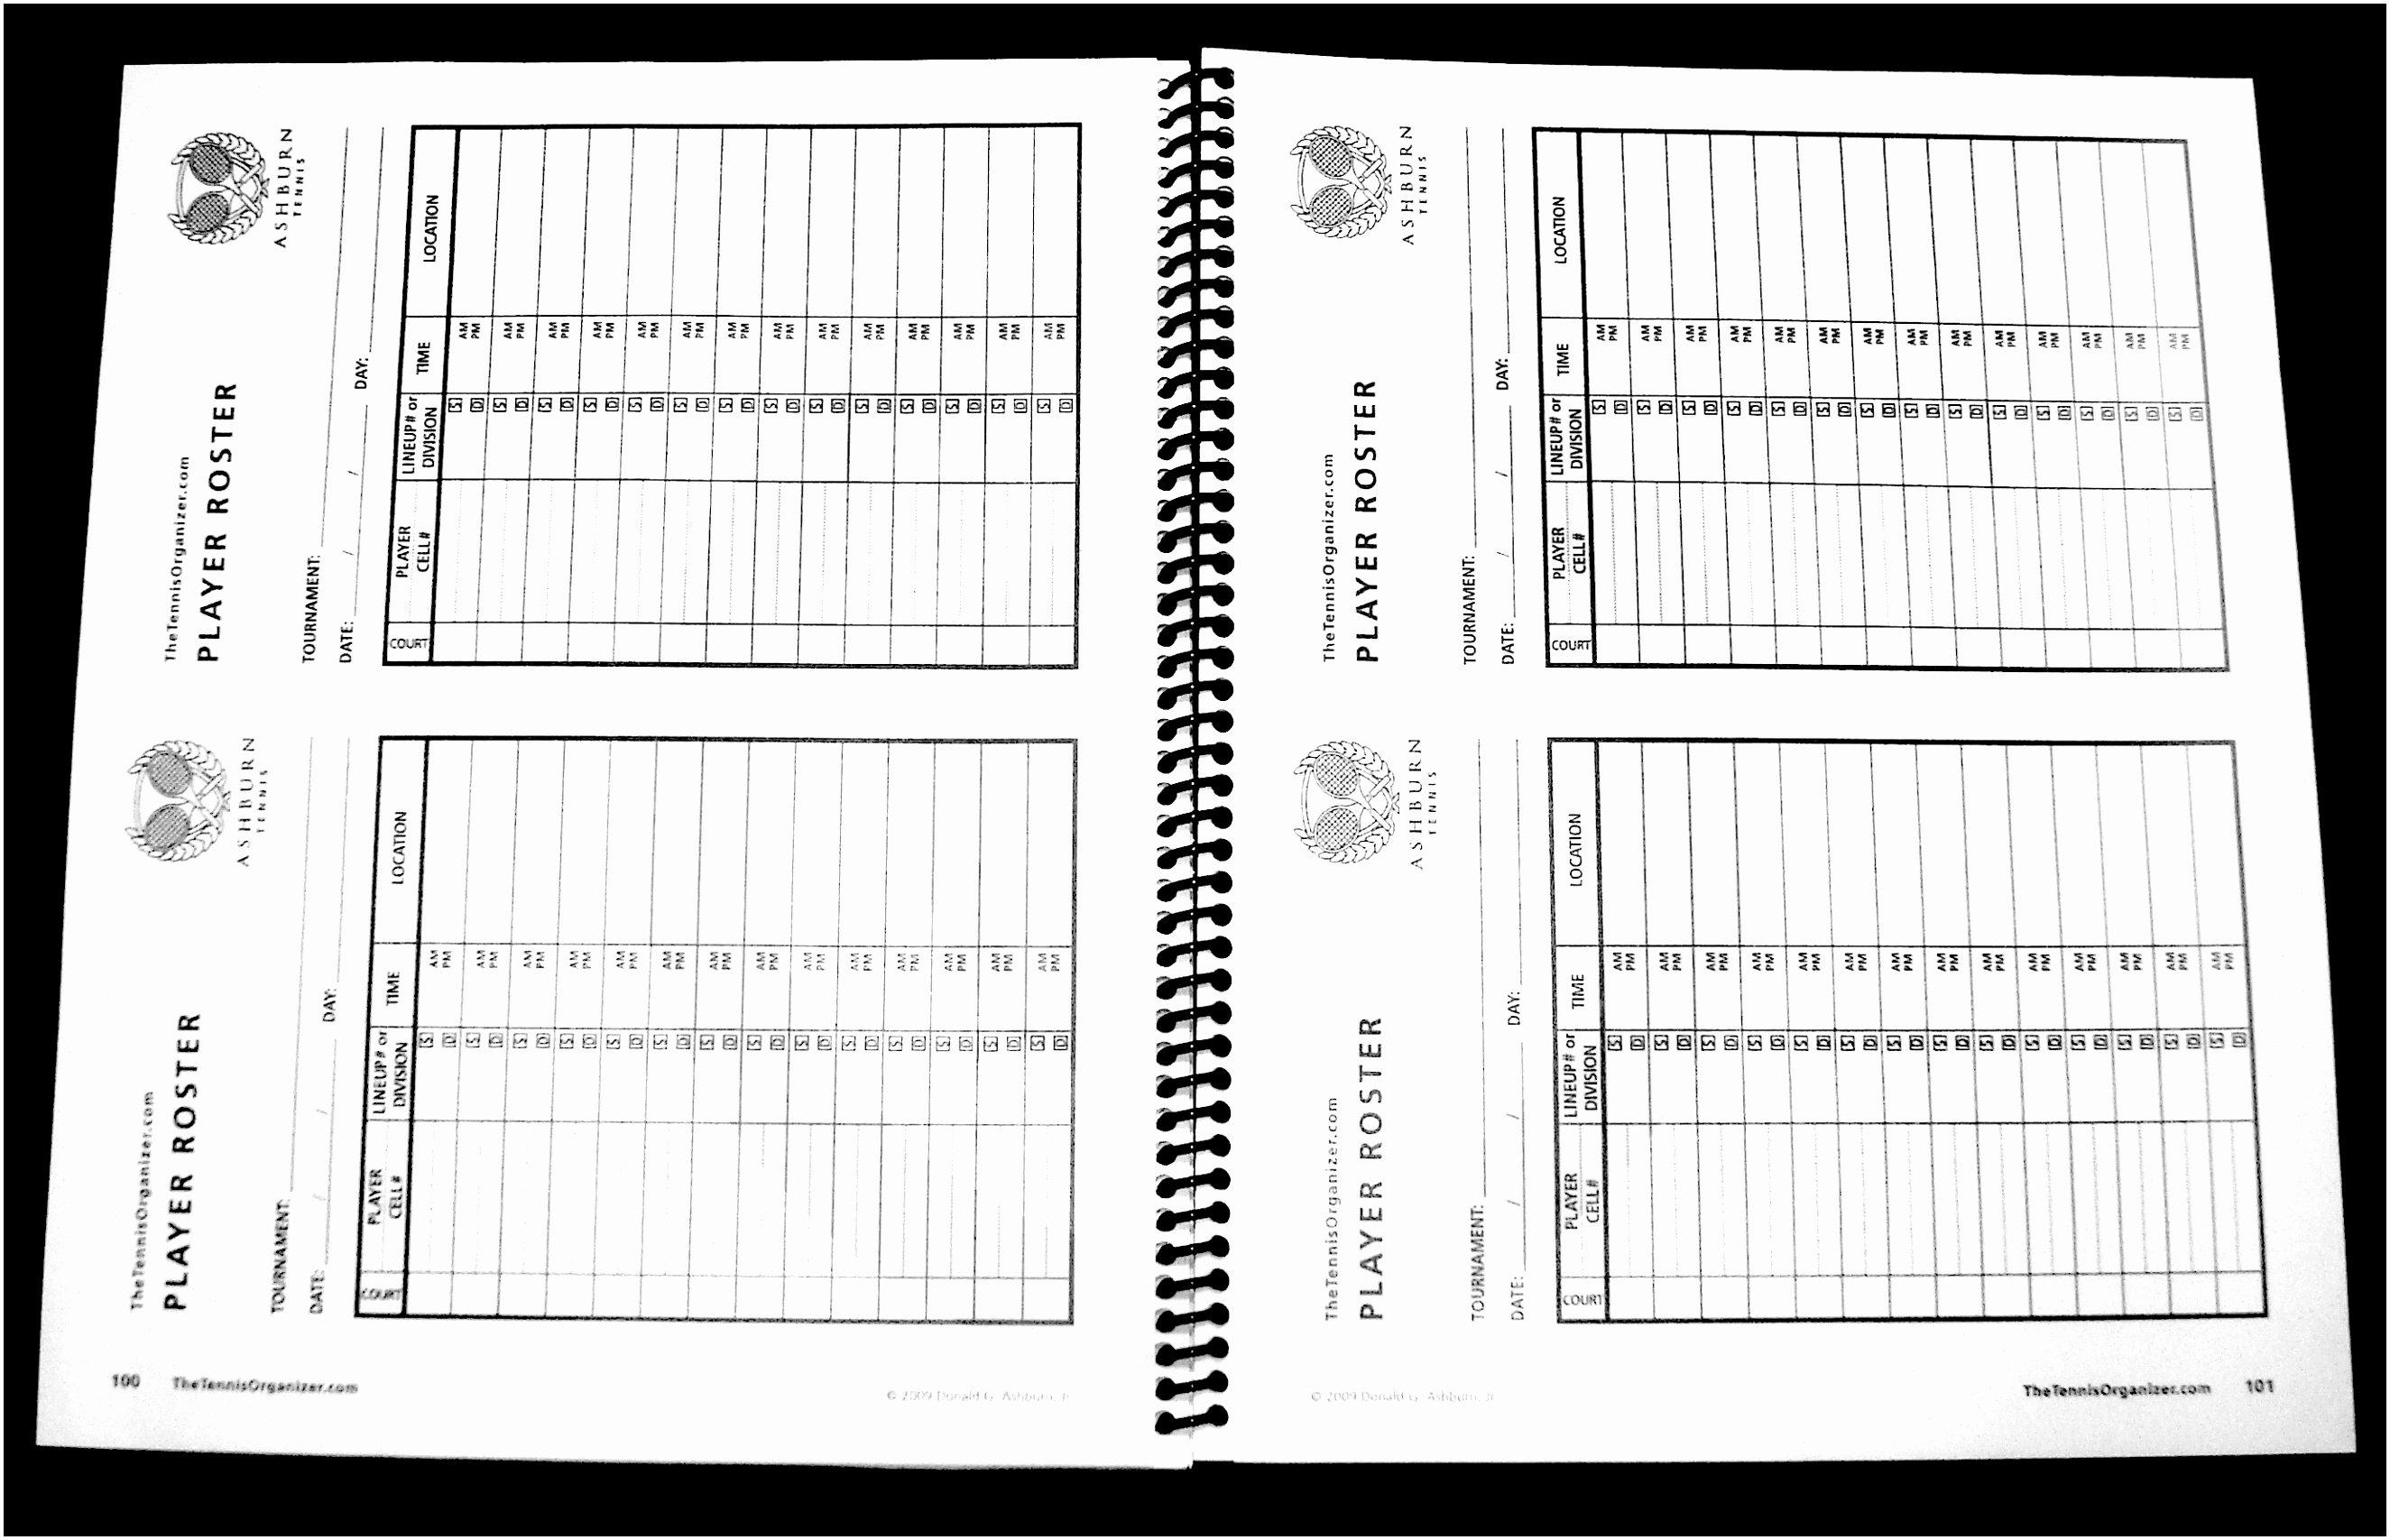 Football Depth Chart Template Excel format Lovely 5 Printable Football Depth Chart Template Yaouu